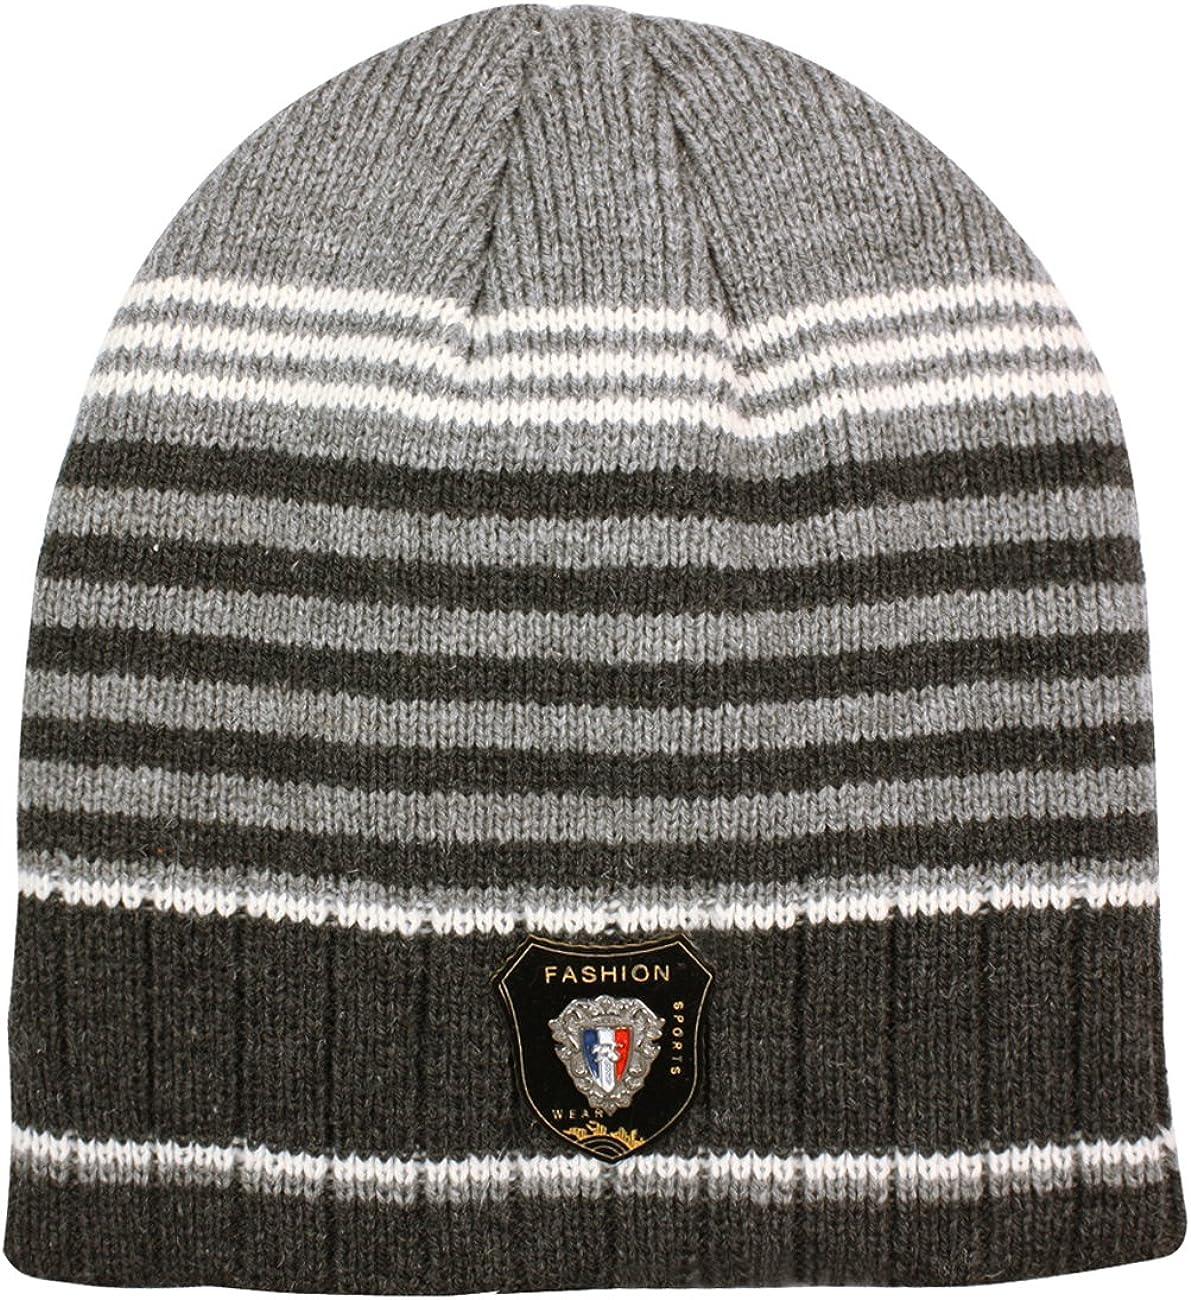 Dahlia Men's Skullies & Beanies - Wool, Knitted Winter Hat, Striped